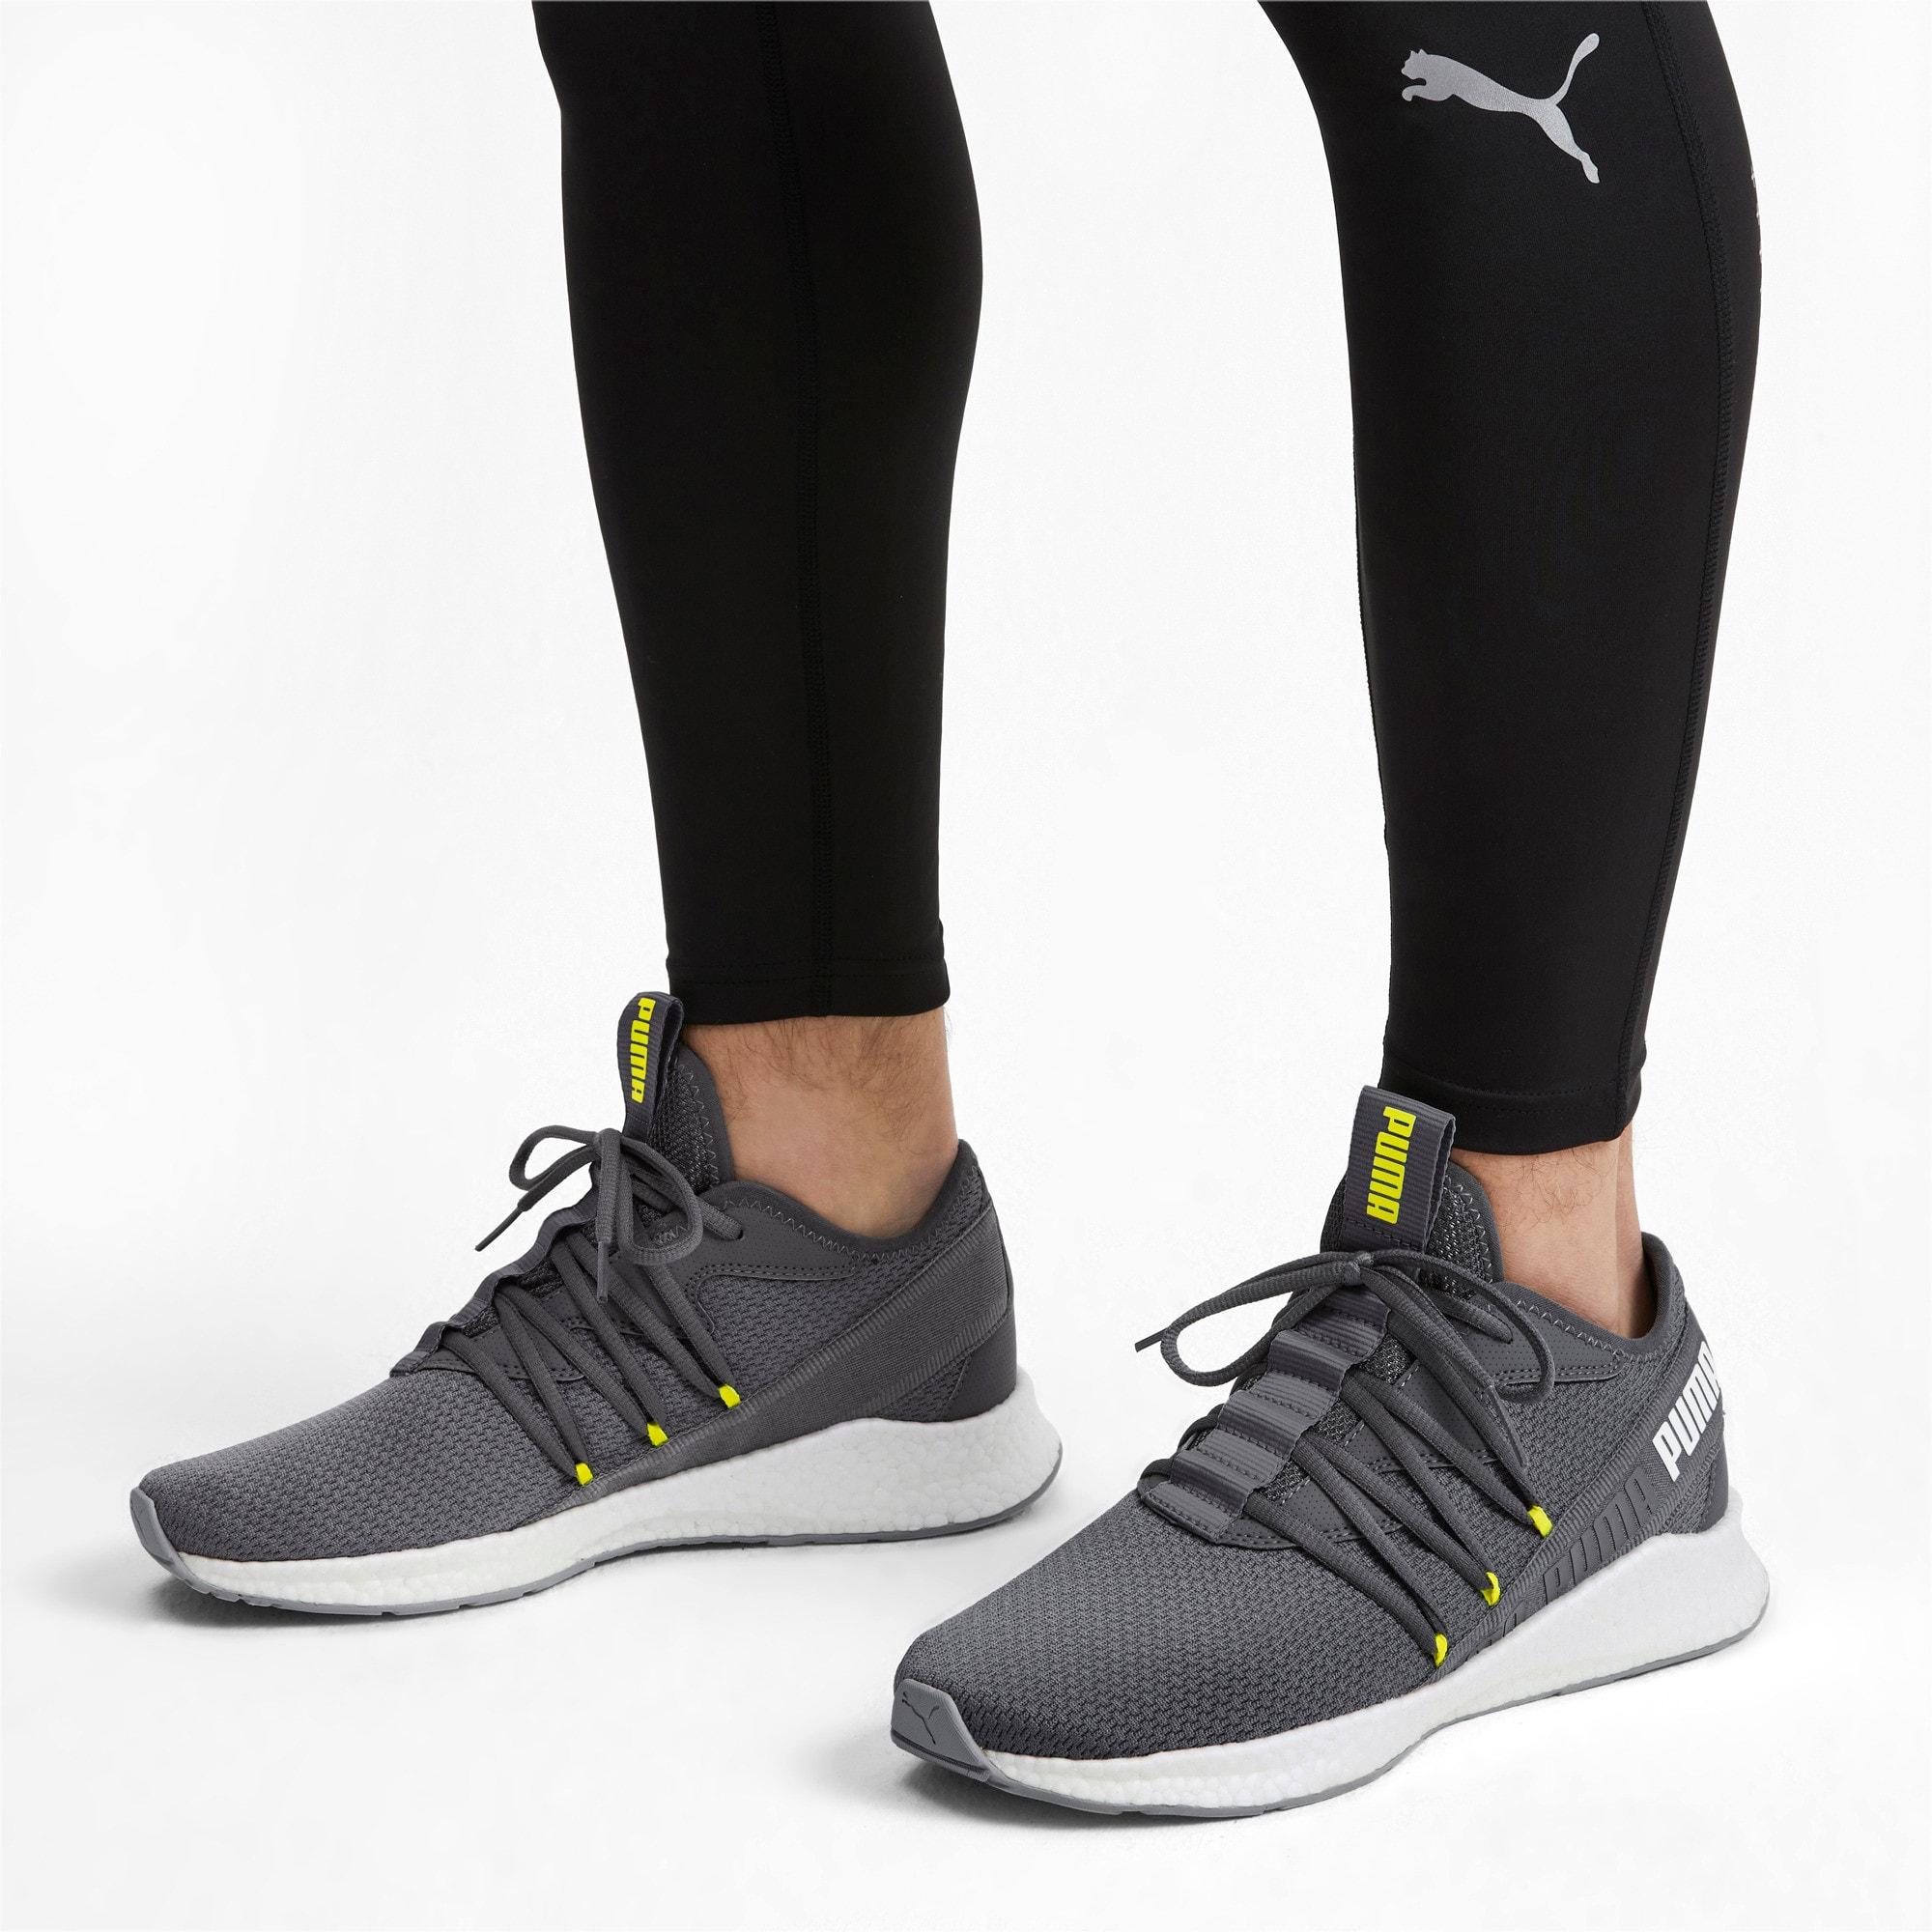 Thumbnail 2 of NRGY Star Running Shoes, CASTLEROCK-White-Yellow, medium